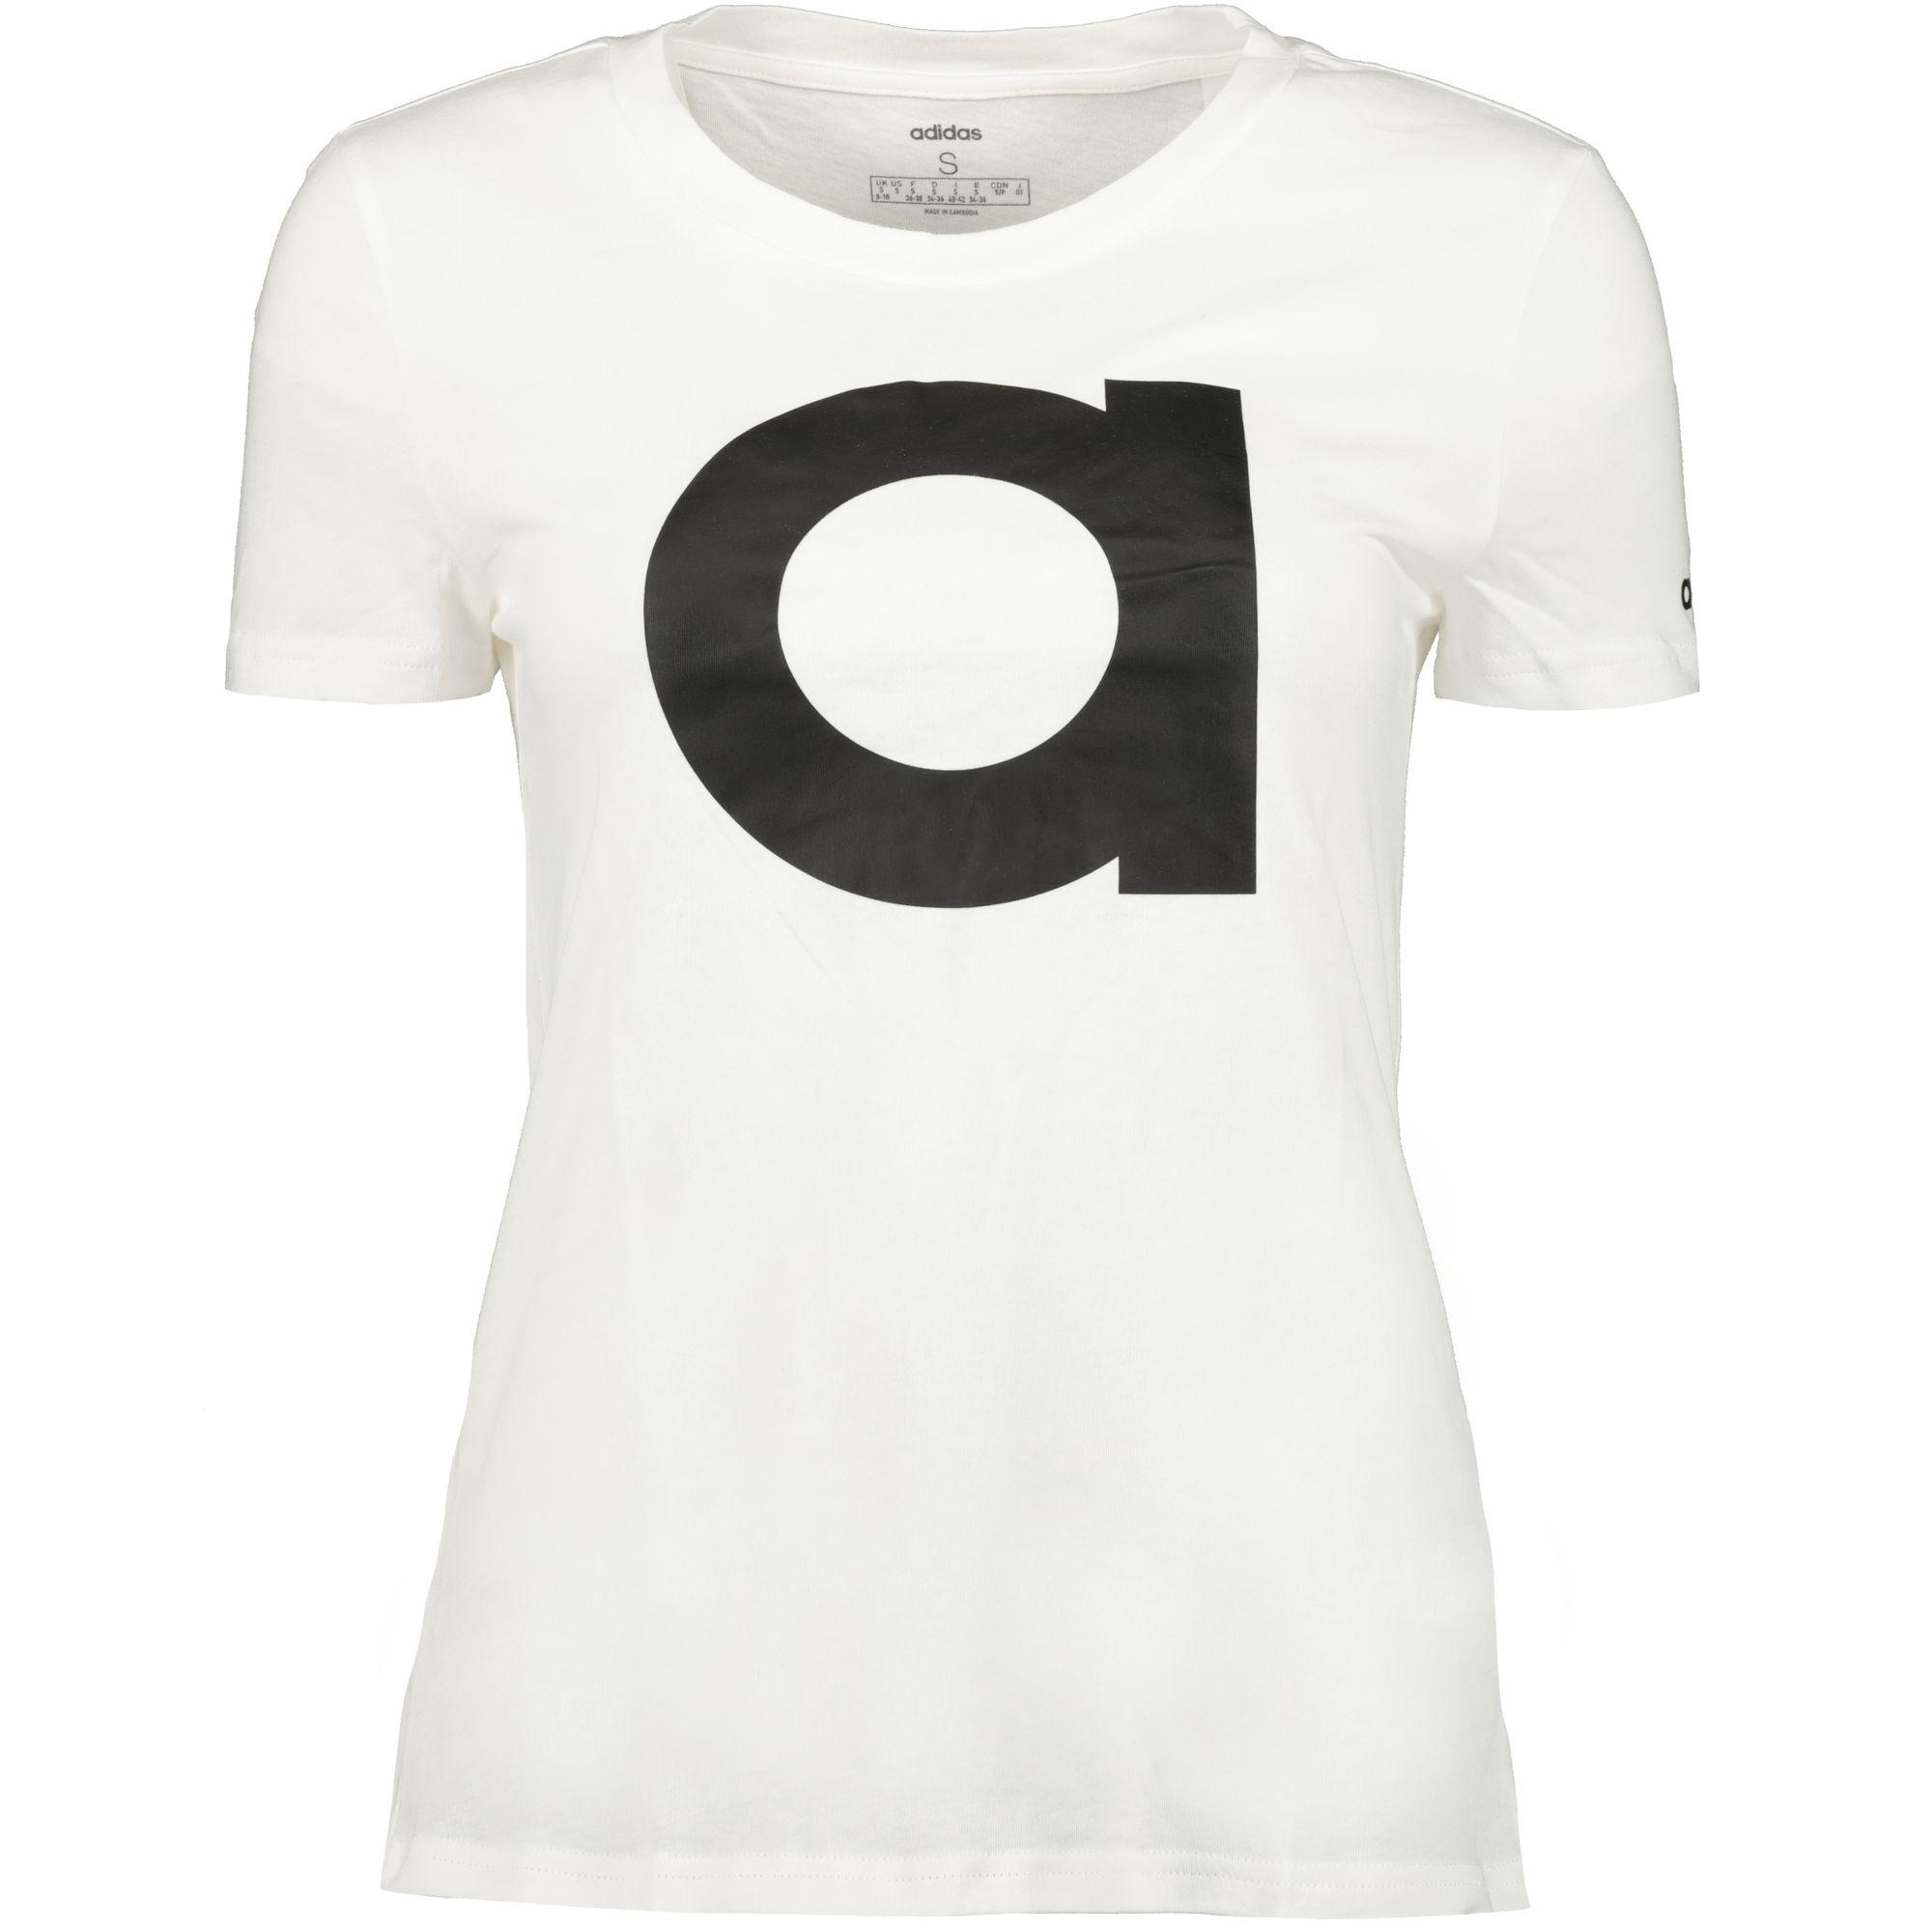 c6f204035ebab adidas performance W E Brand Tee Damen Freizeitshirt white/black ...